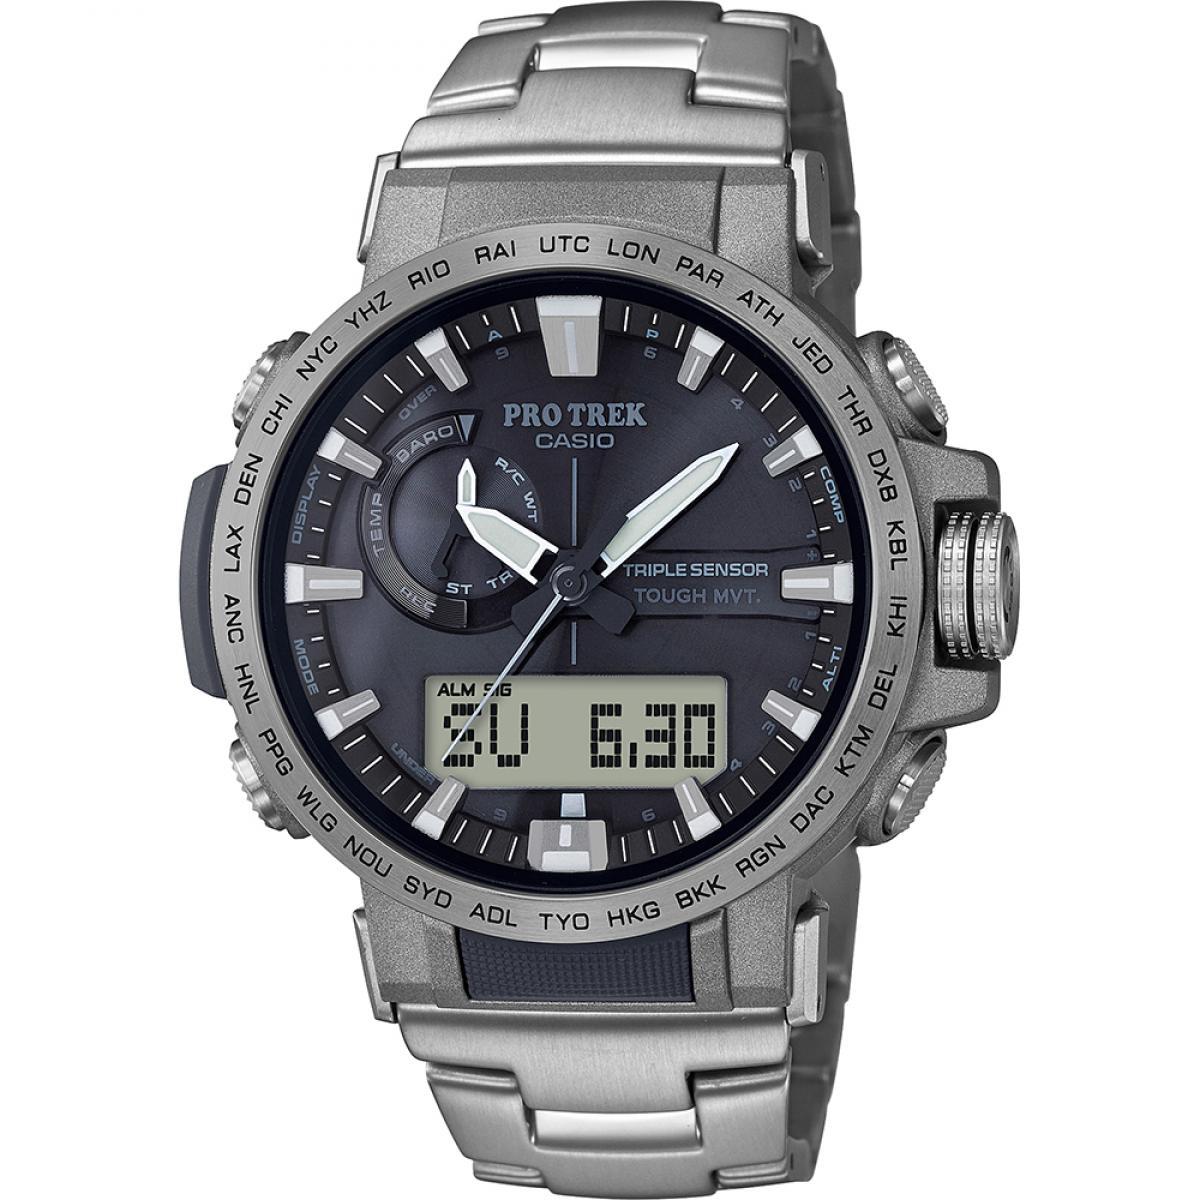 Montre Casio PRW 60T 7AER Montre Titane Chronographe Homme Plus d'infos